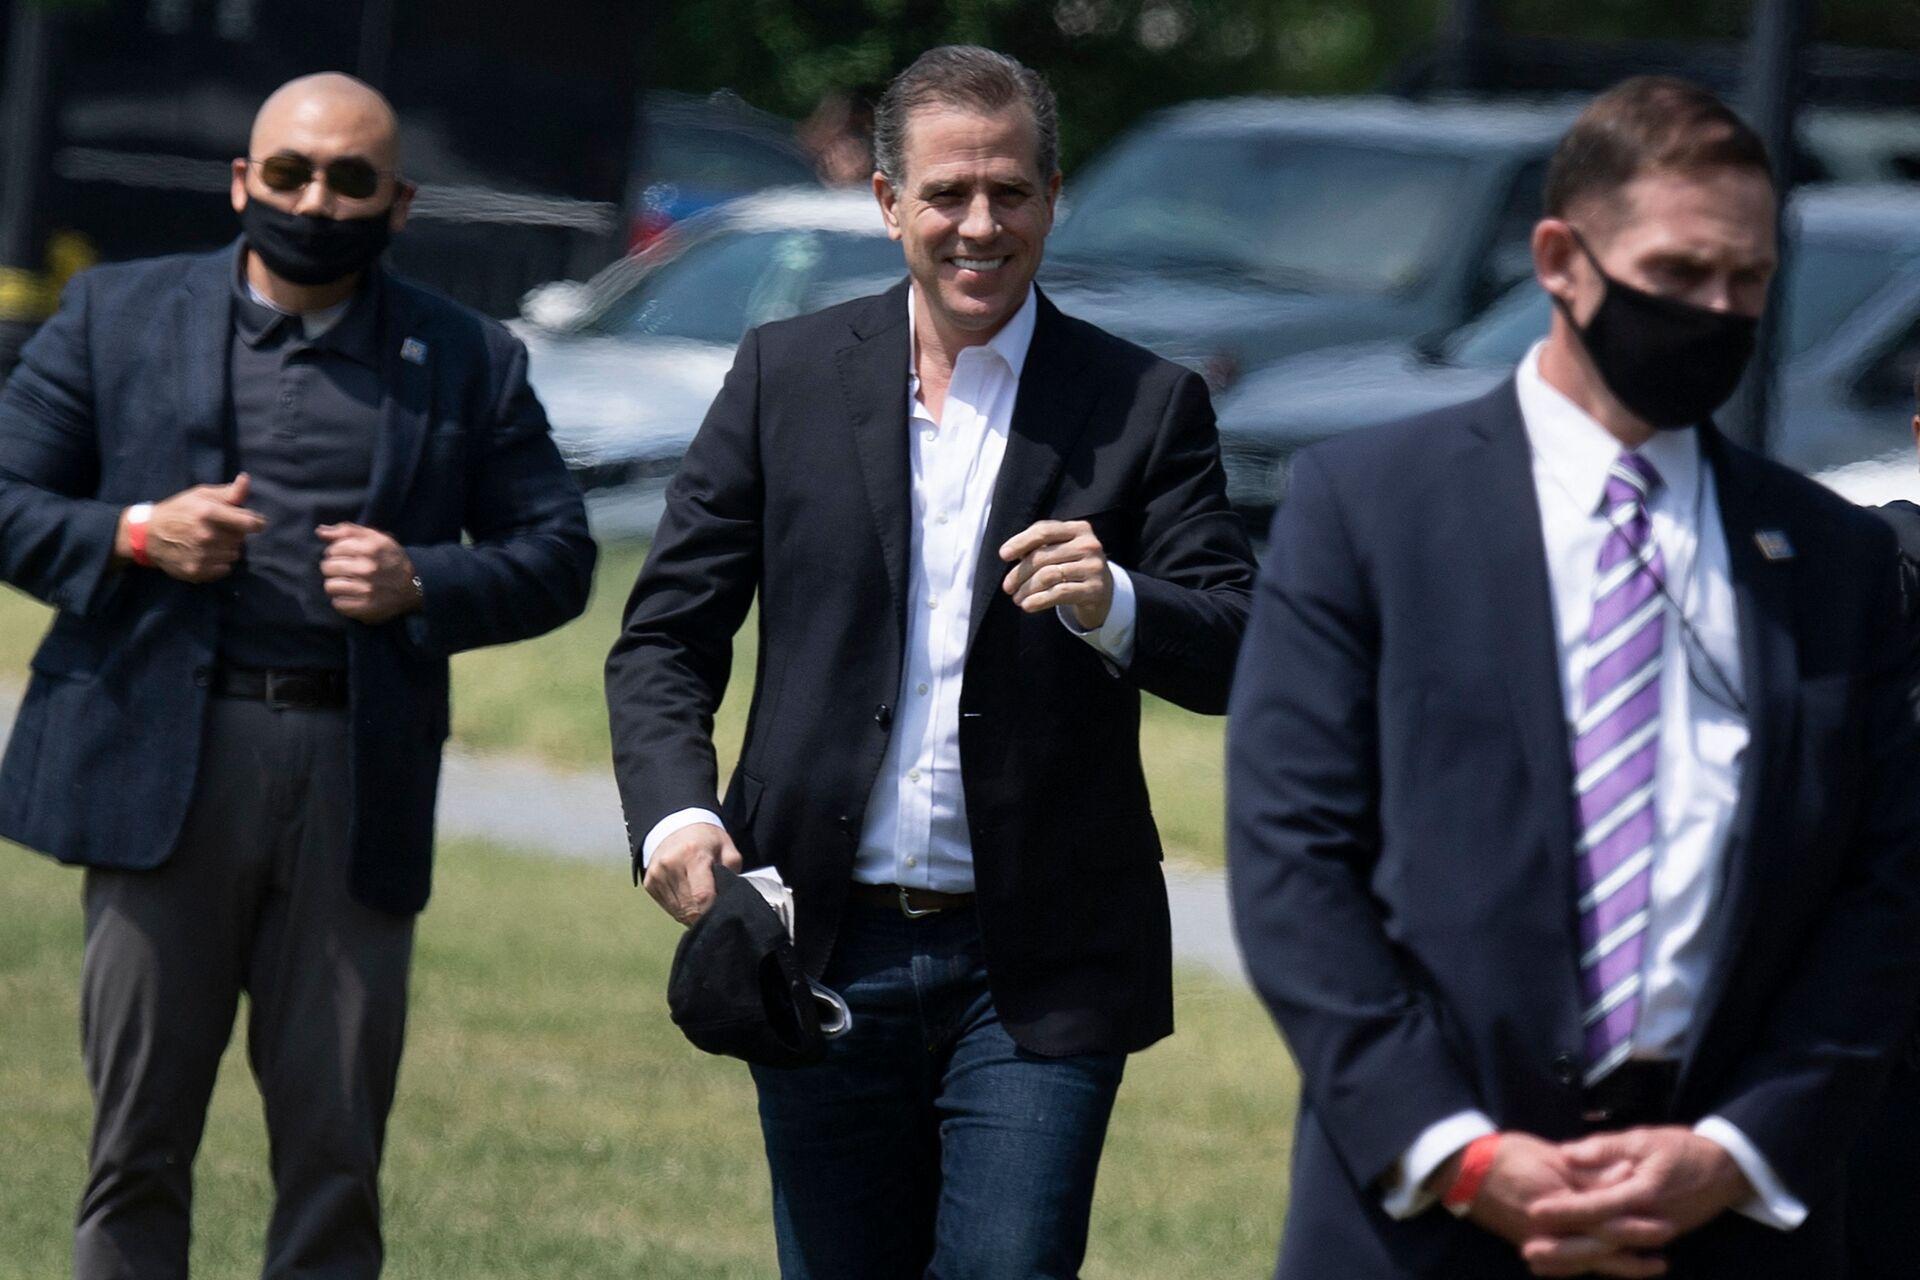 Hunter Biden walks to Marine One on the Ellipse outside the White House May 22, 2021, in Washington, DC. - Sputnik International, 1920, 07.09.2021